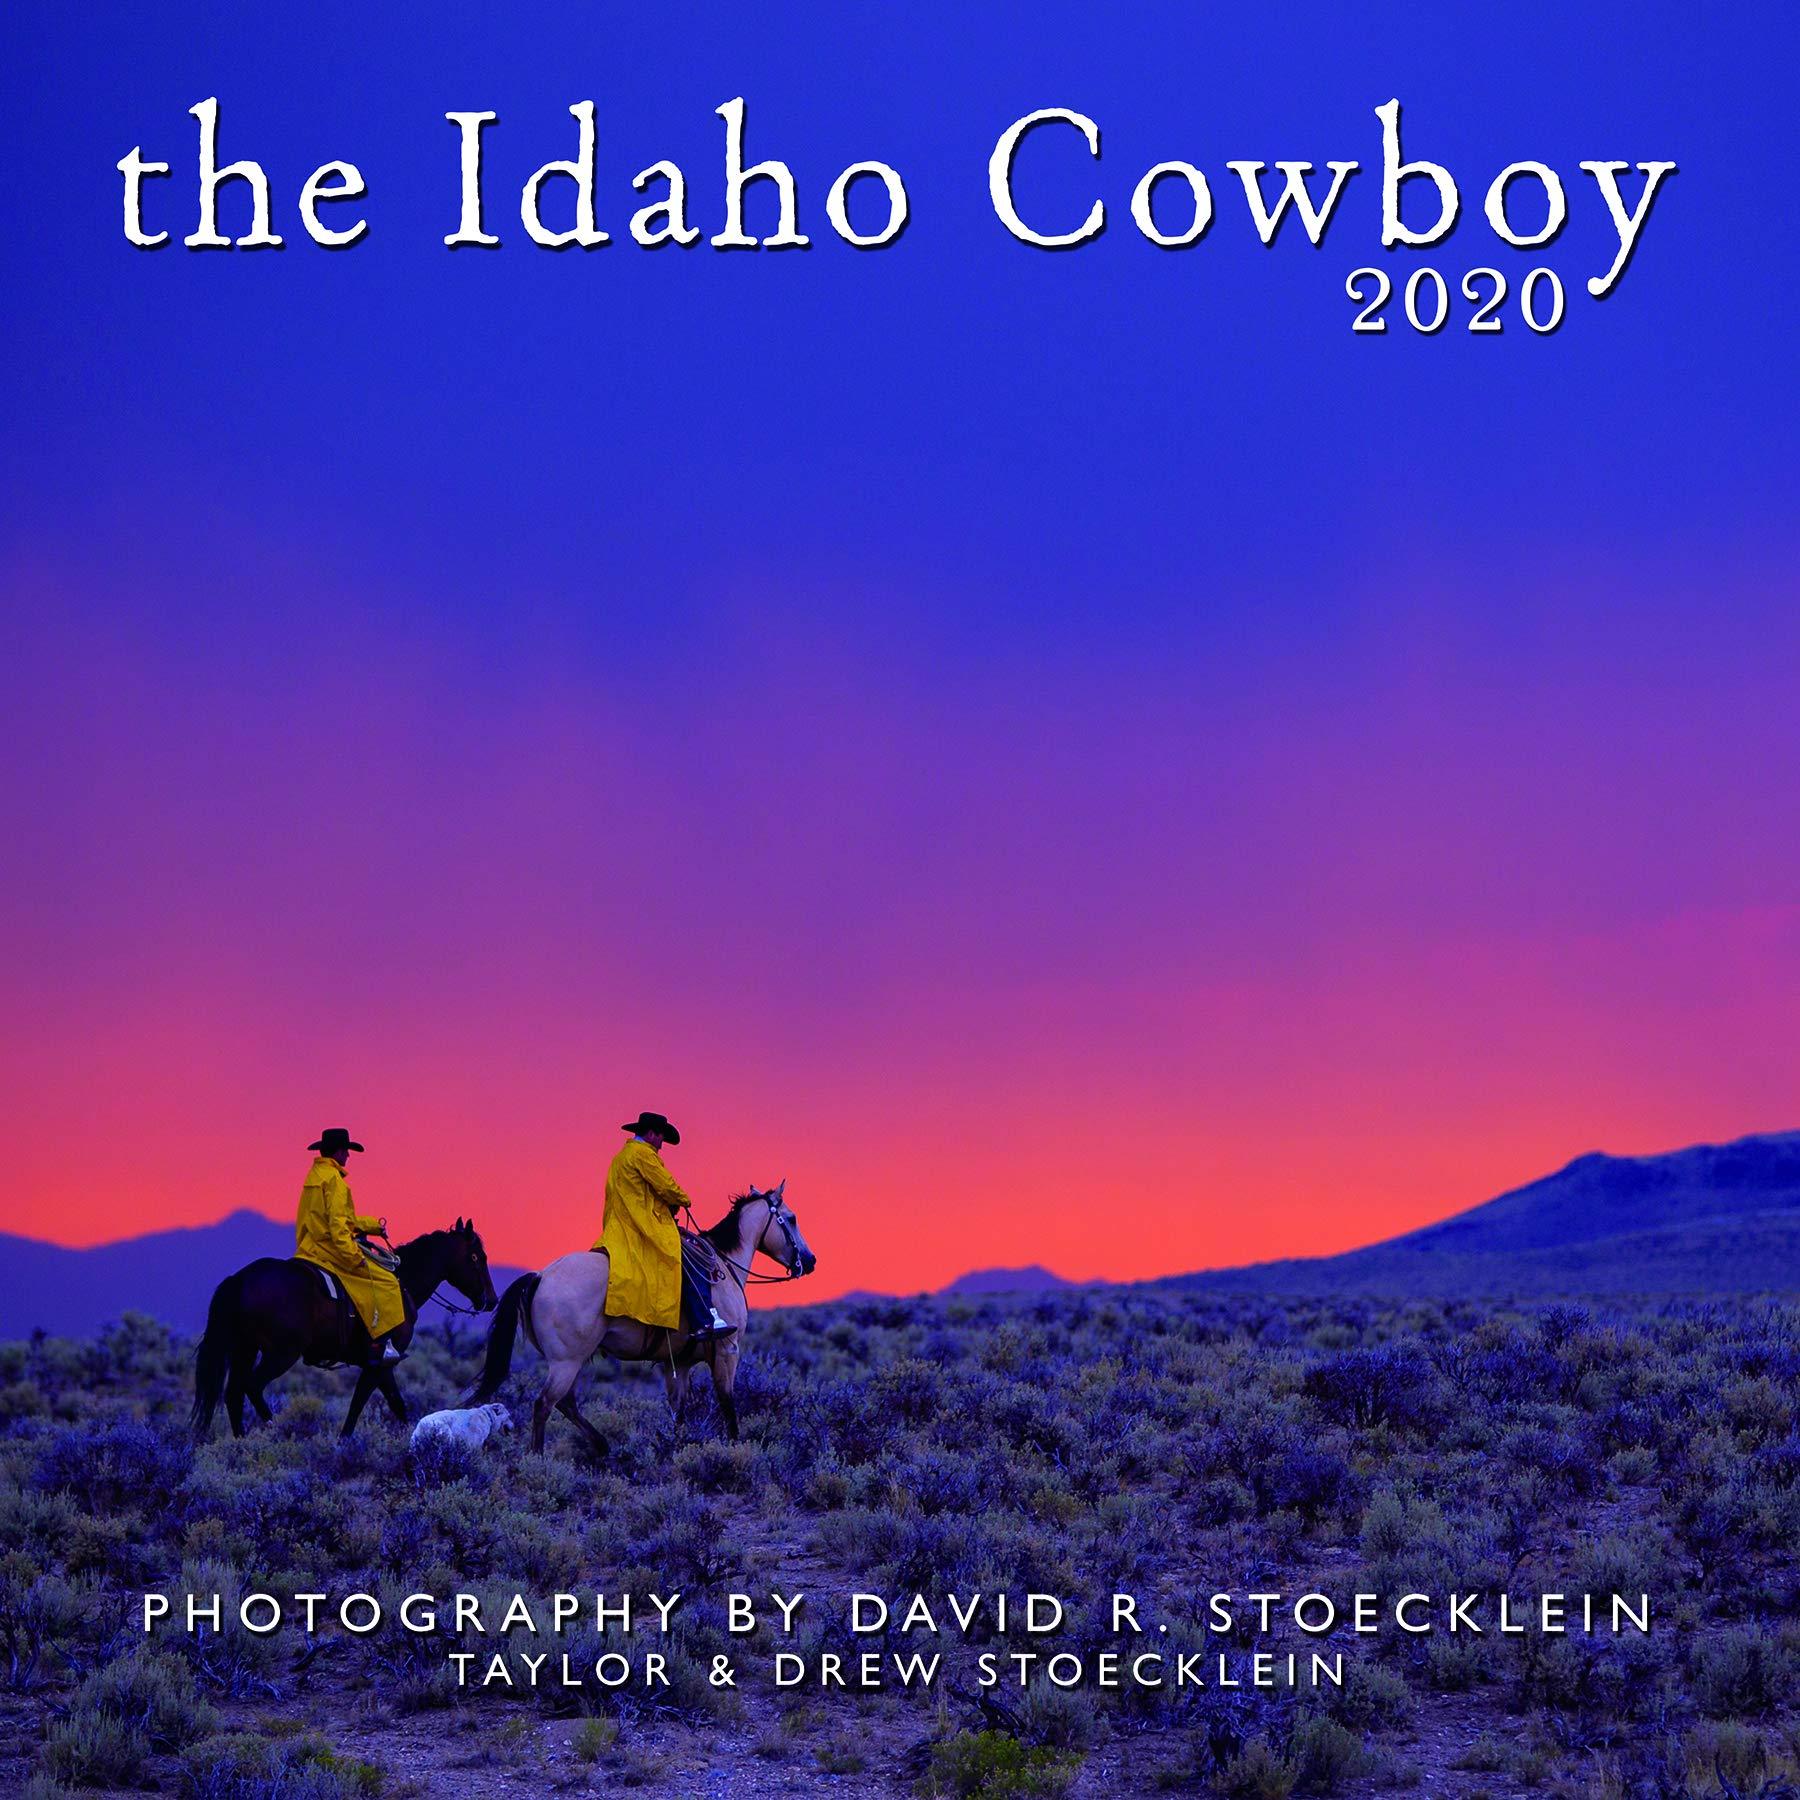 Cowboy Calendar 2020 2020 Idaho Cowboy Calendar: DAVID R STOECKLEIN: 9781933192505